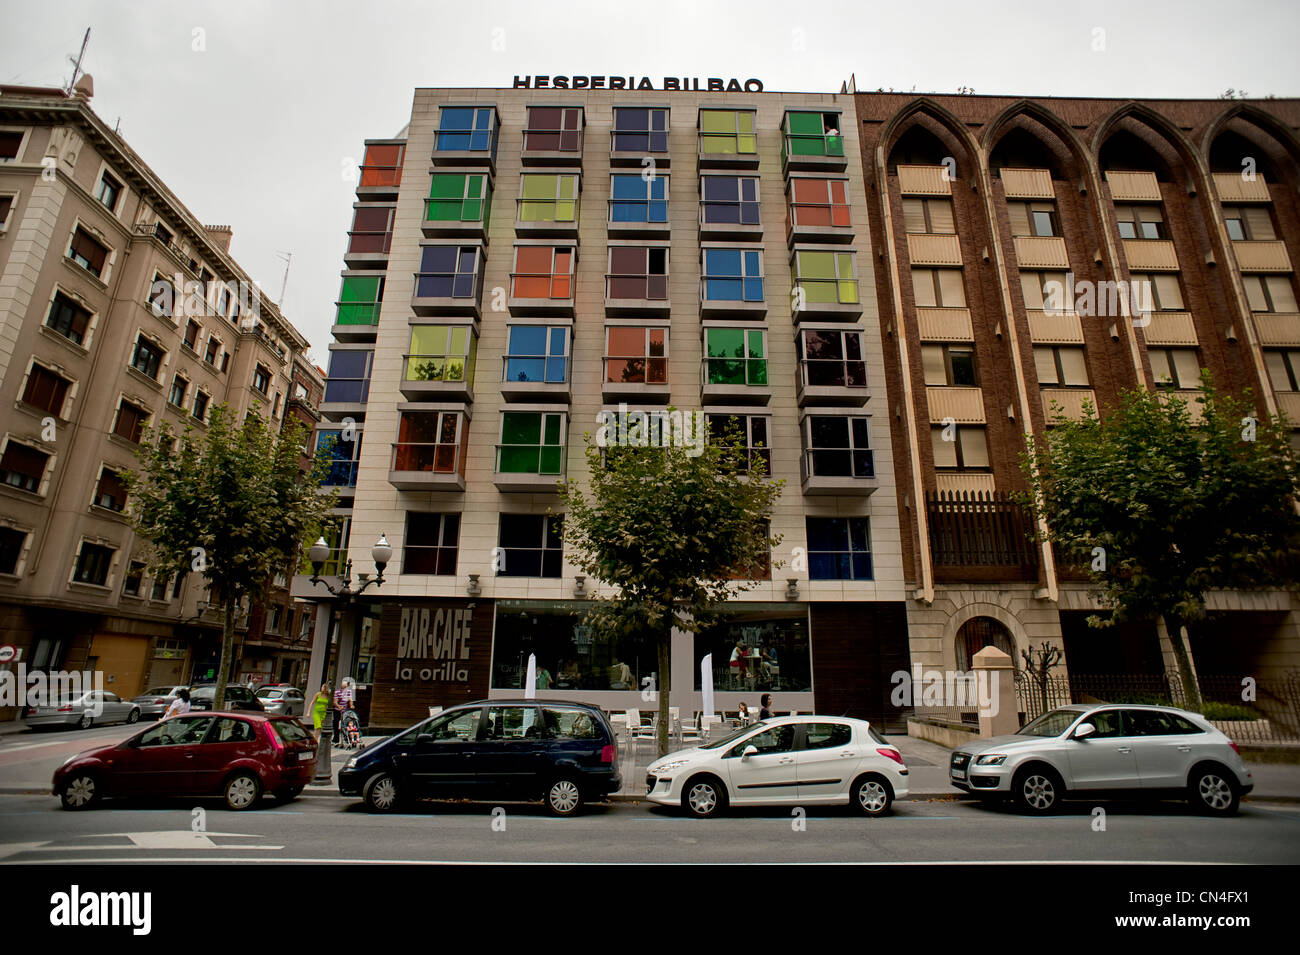 facade of the hesperia hotel in bilbao, basque country, spain Stock Photo